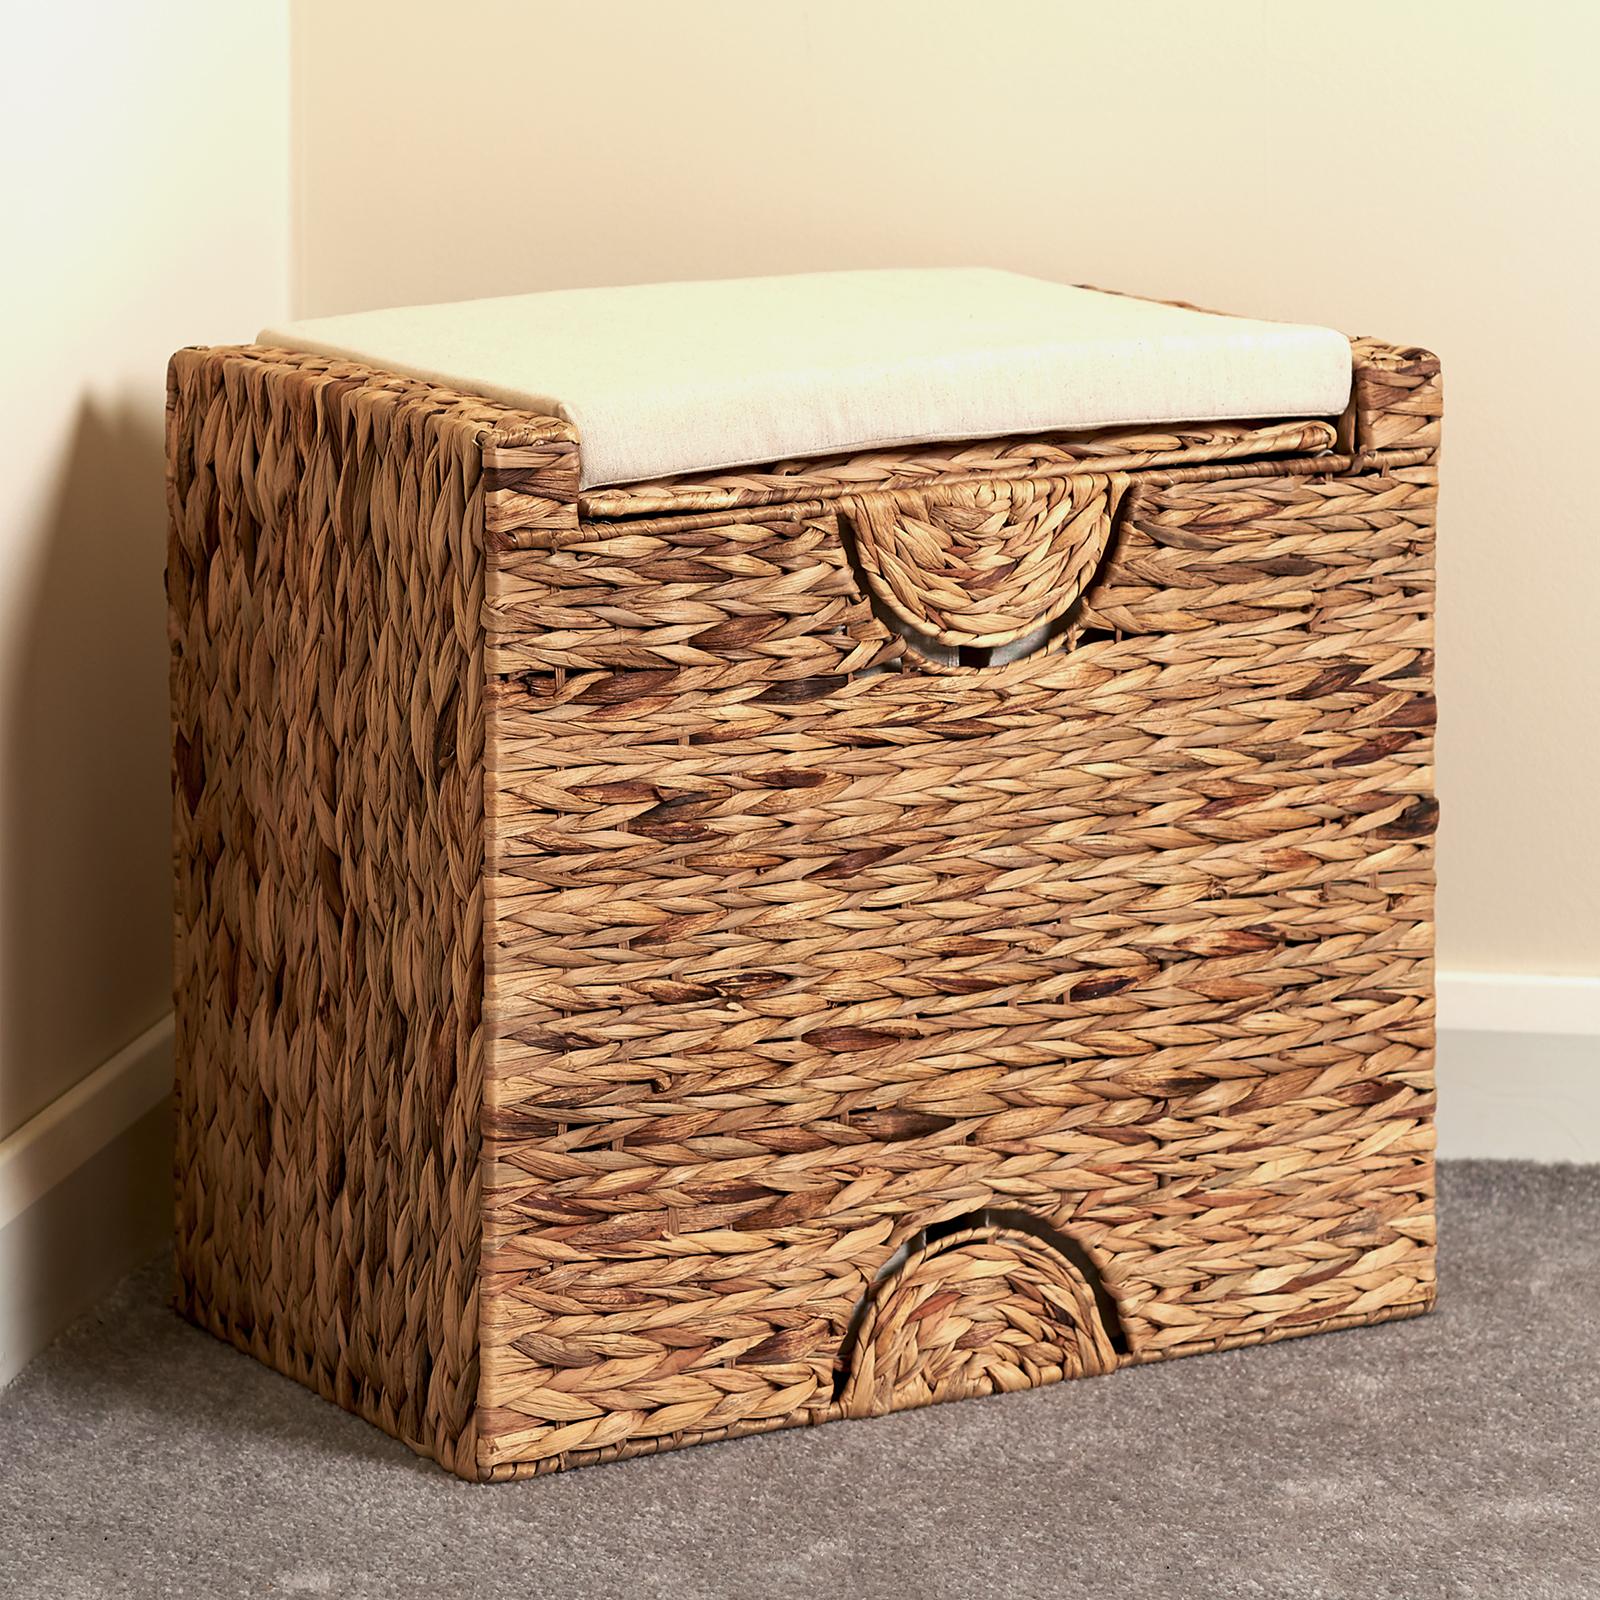 Sentinel Hartleys Laundry Basket Storage Bench Seat Bedroom Hallway Clothes Linen Hamper